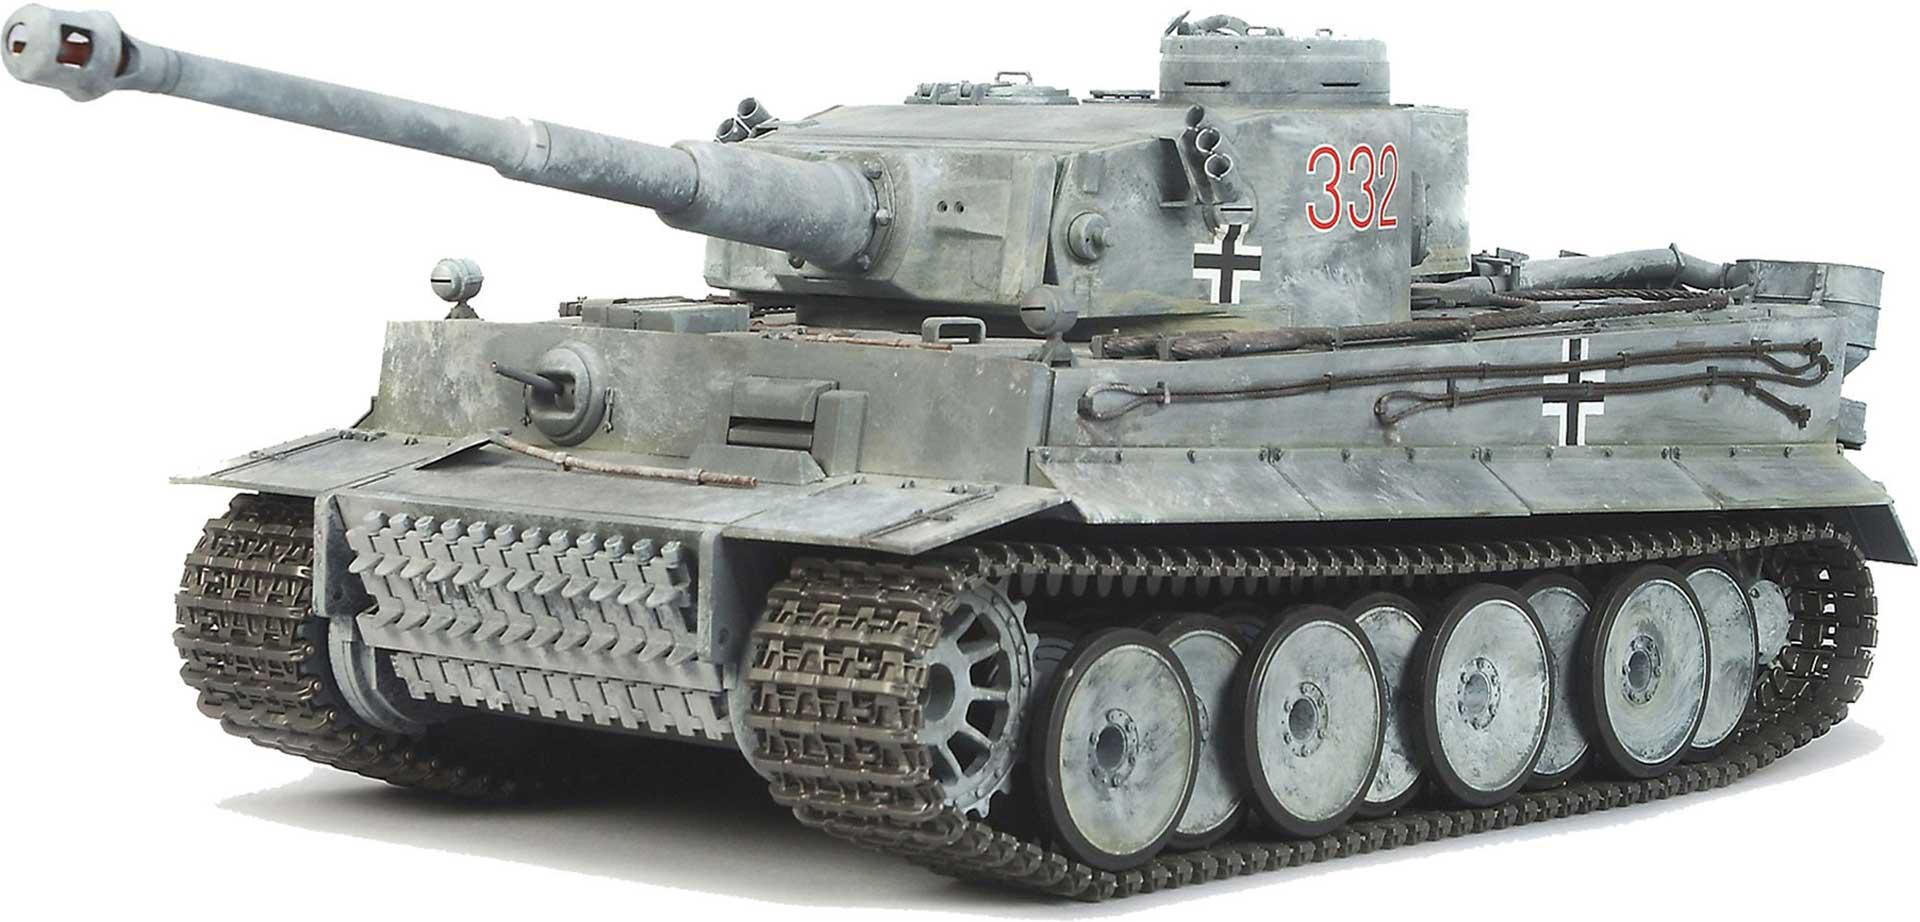 TAMIYA TIGER I PANZER 1/16 M.DMD T-03 MF-01 TAM